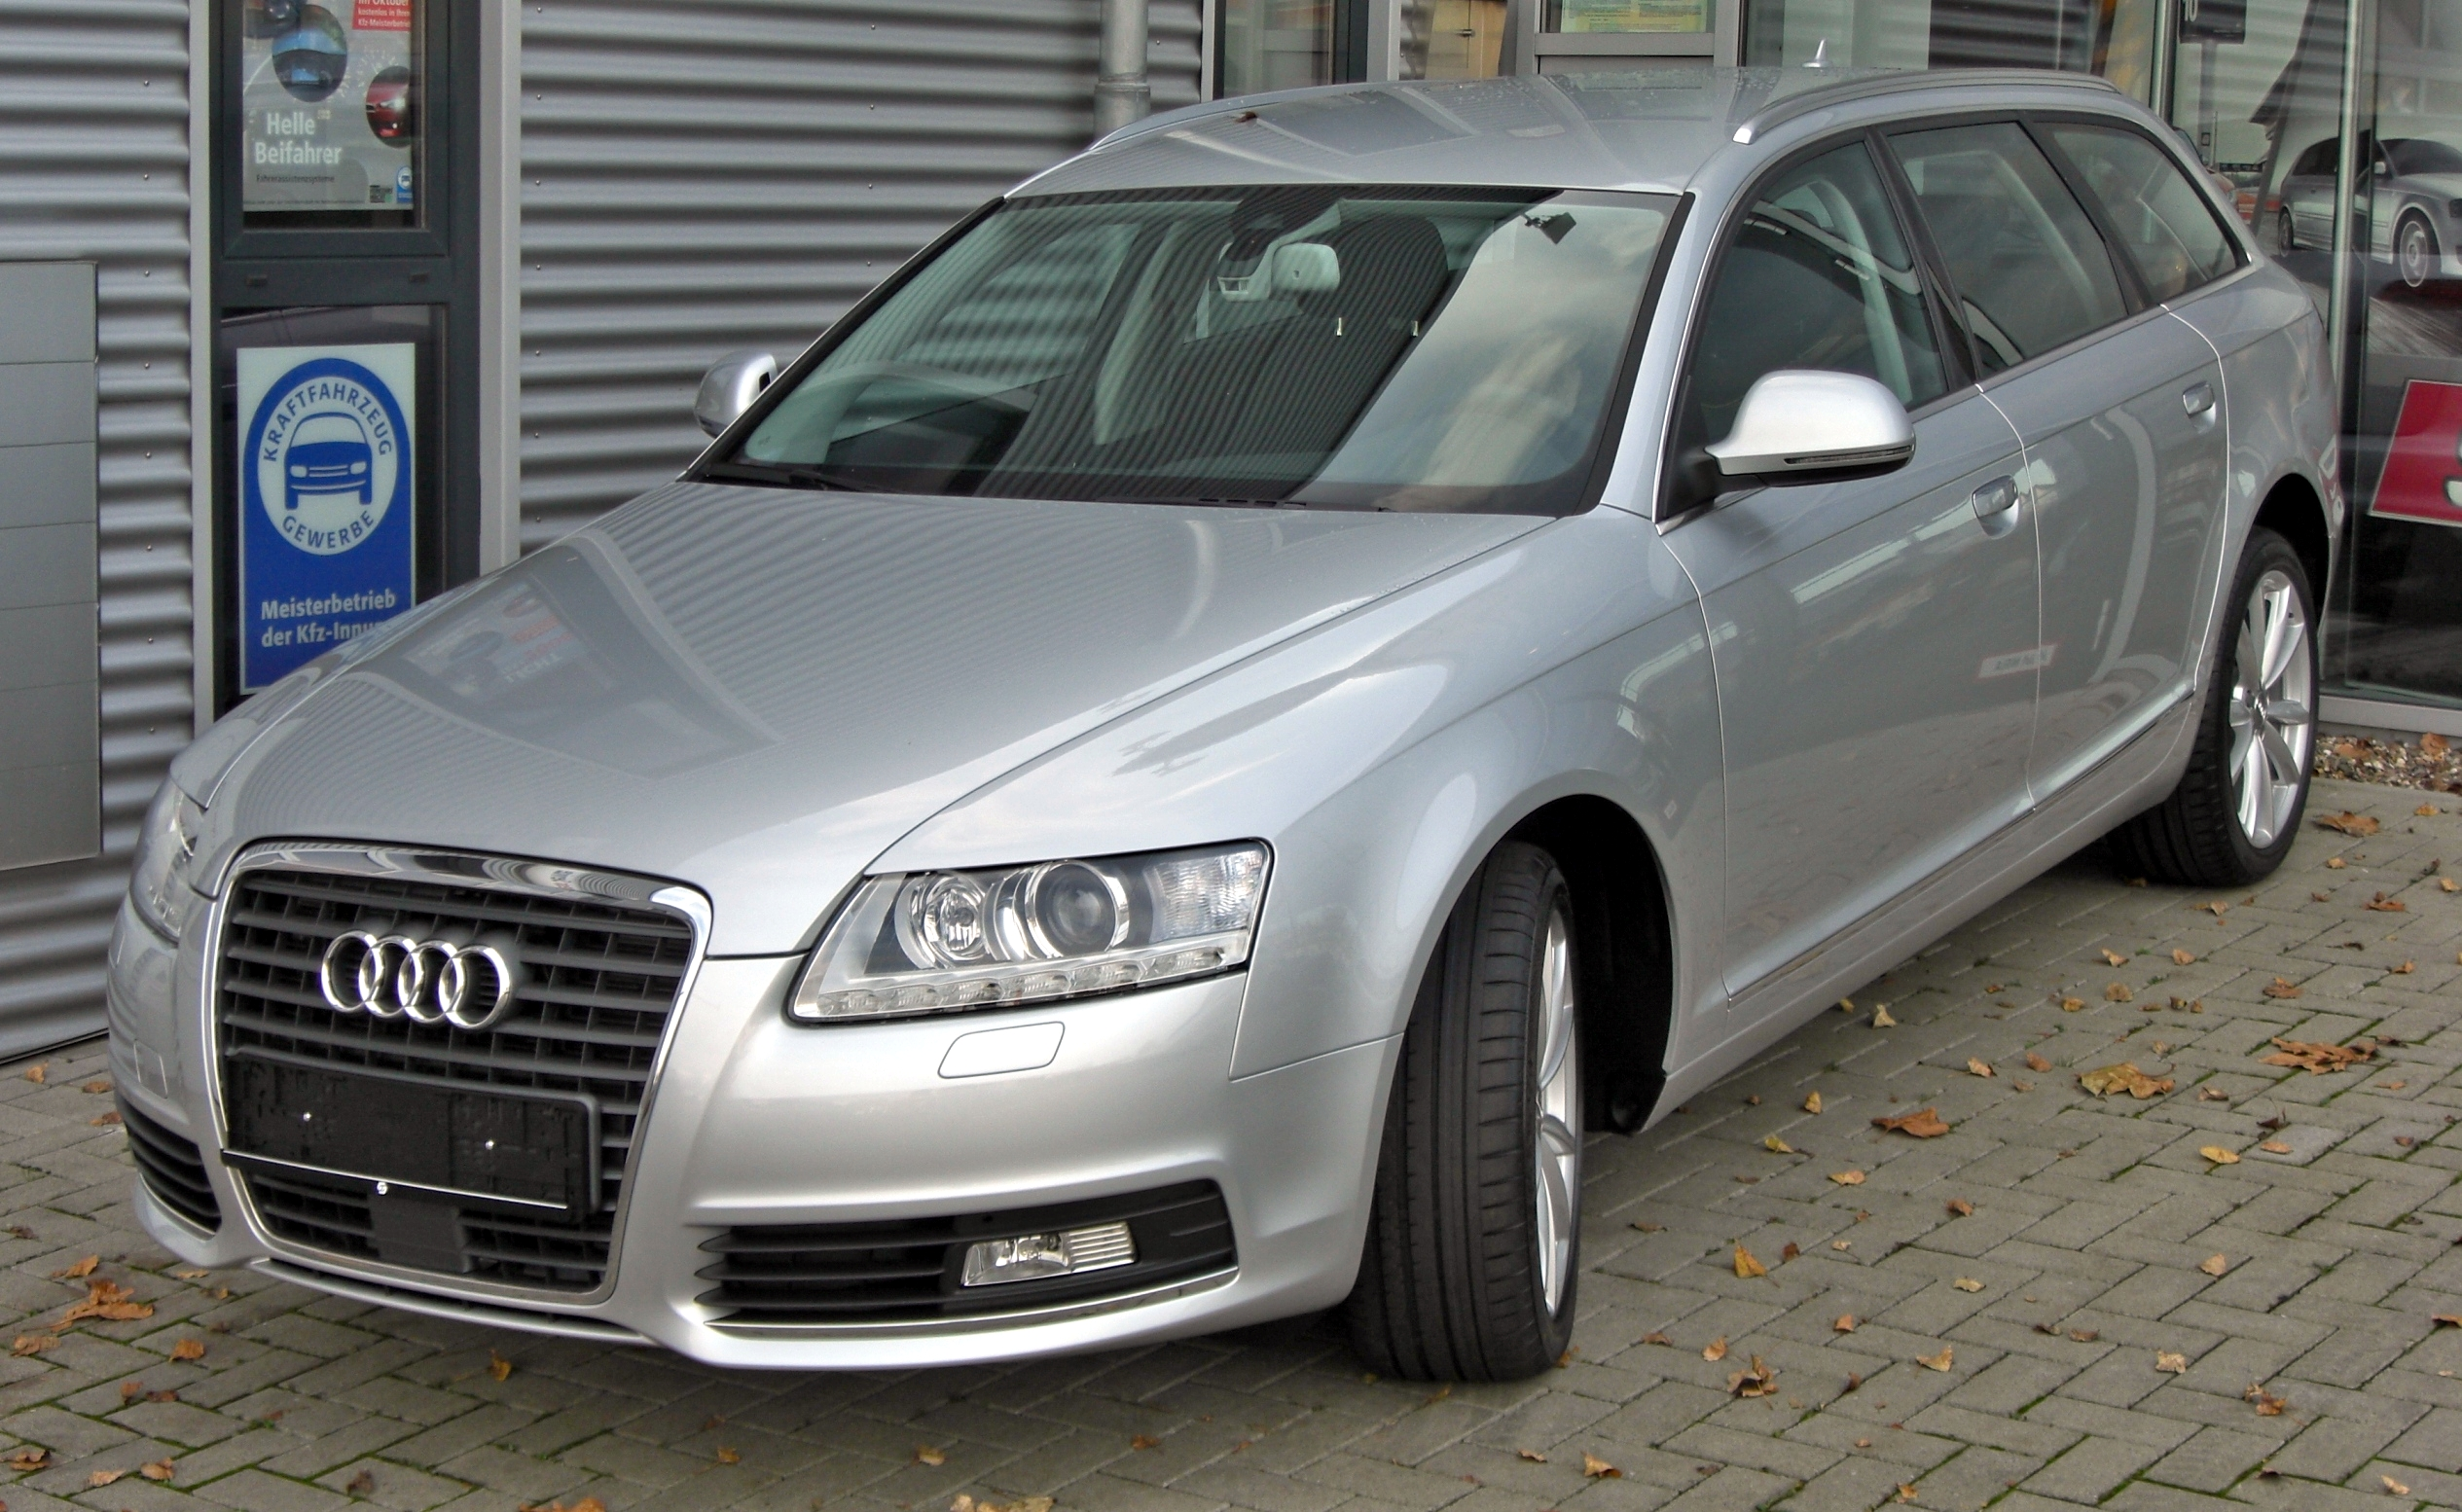 Audi A6 Facelift Html Autos Post